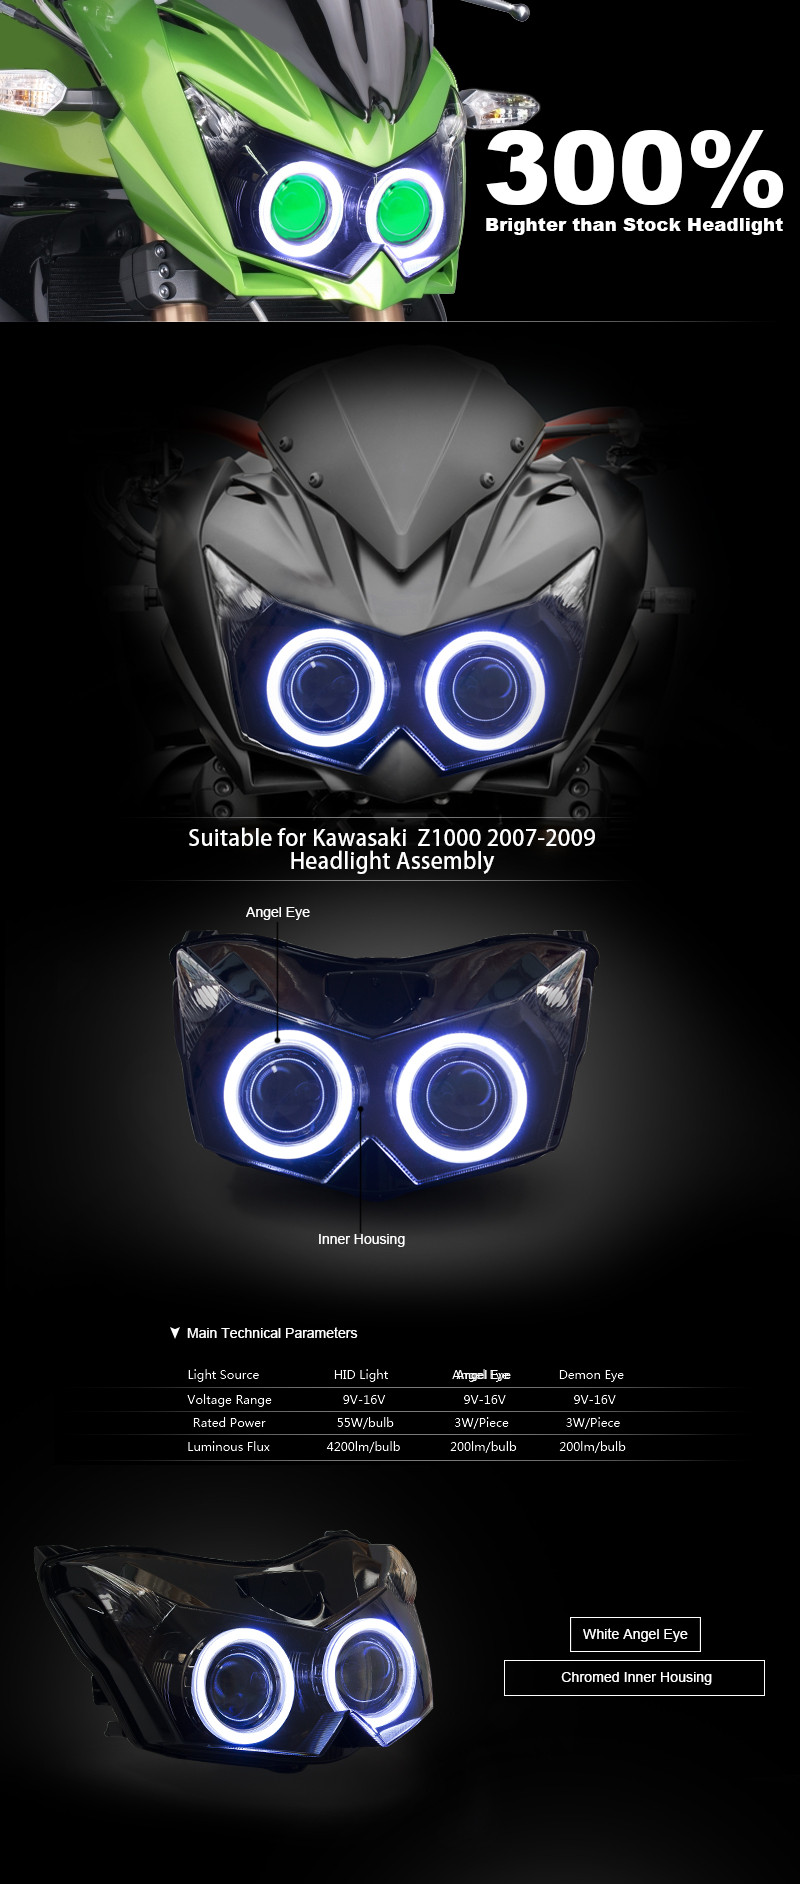 e460fbaf48cc34 ᗜ LjഃKT Koplamp voor Kawasaki Z1000 2007-2009 LED Angel Eye ...